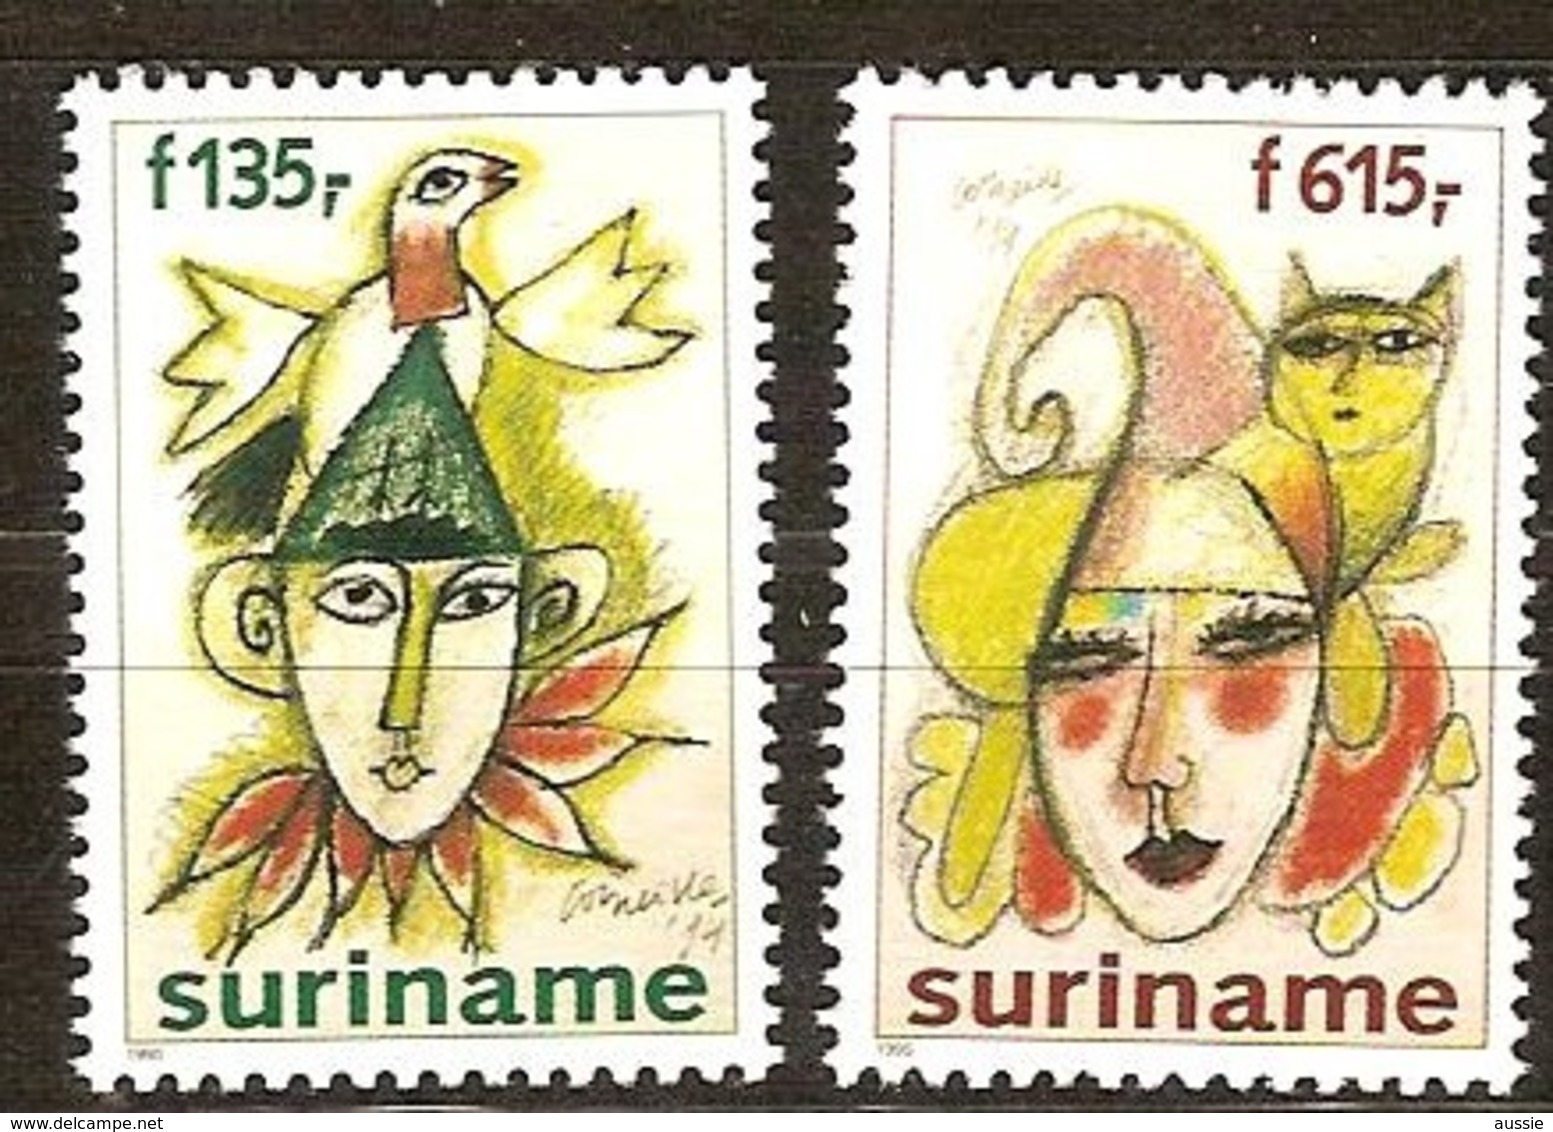 Suriname 1995 Yvertn° 1373-1374 *** MNH Cote 44 FF Le Carnaval - Surinam